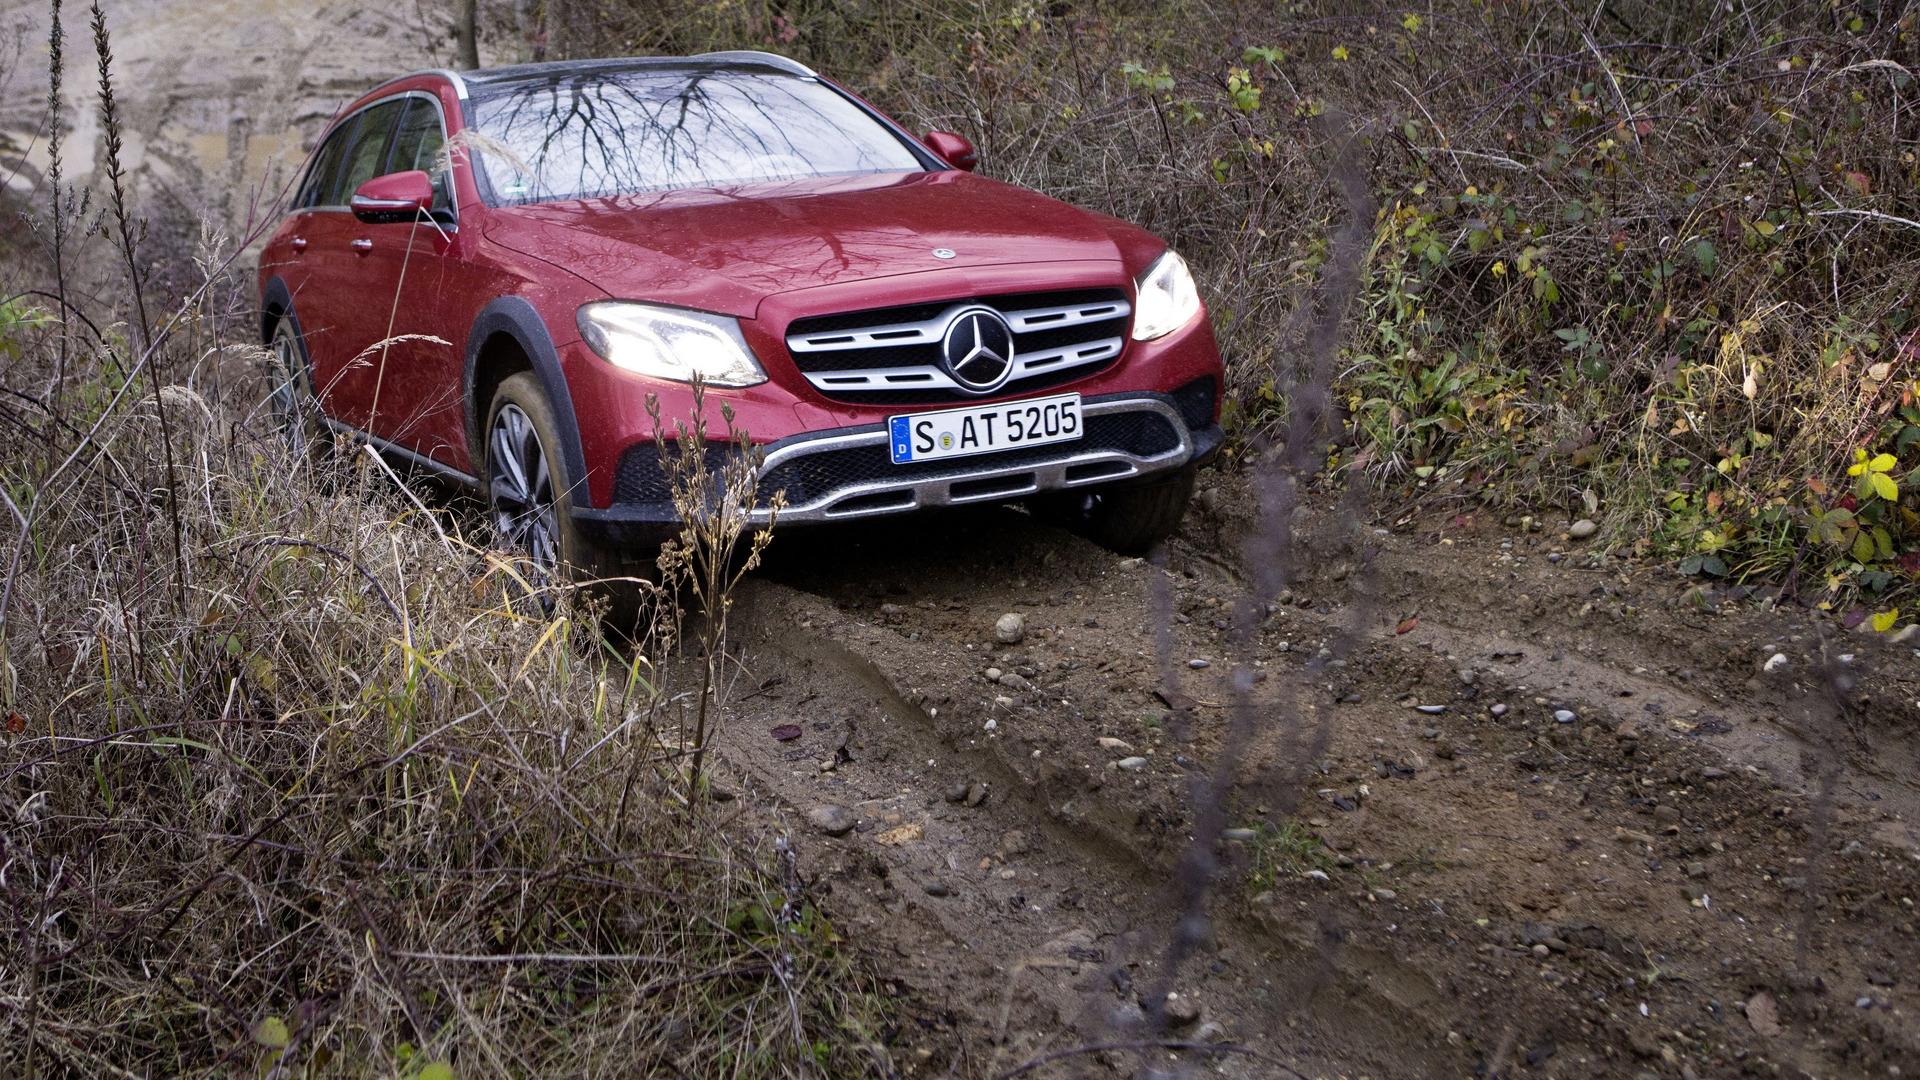 https://icdn-0.motor1.com/images/mgl/e103W/s1/2017-mercedes-e-class-all-terrain.jpg